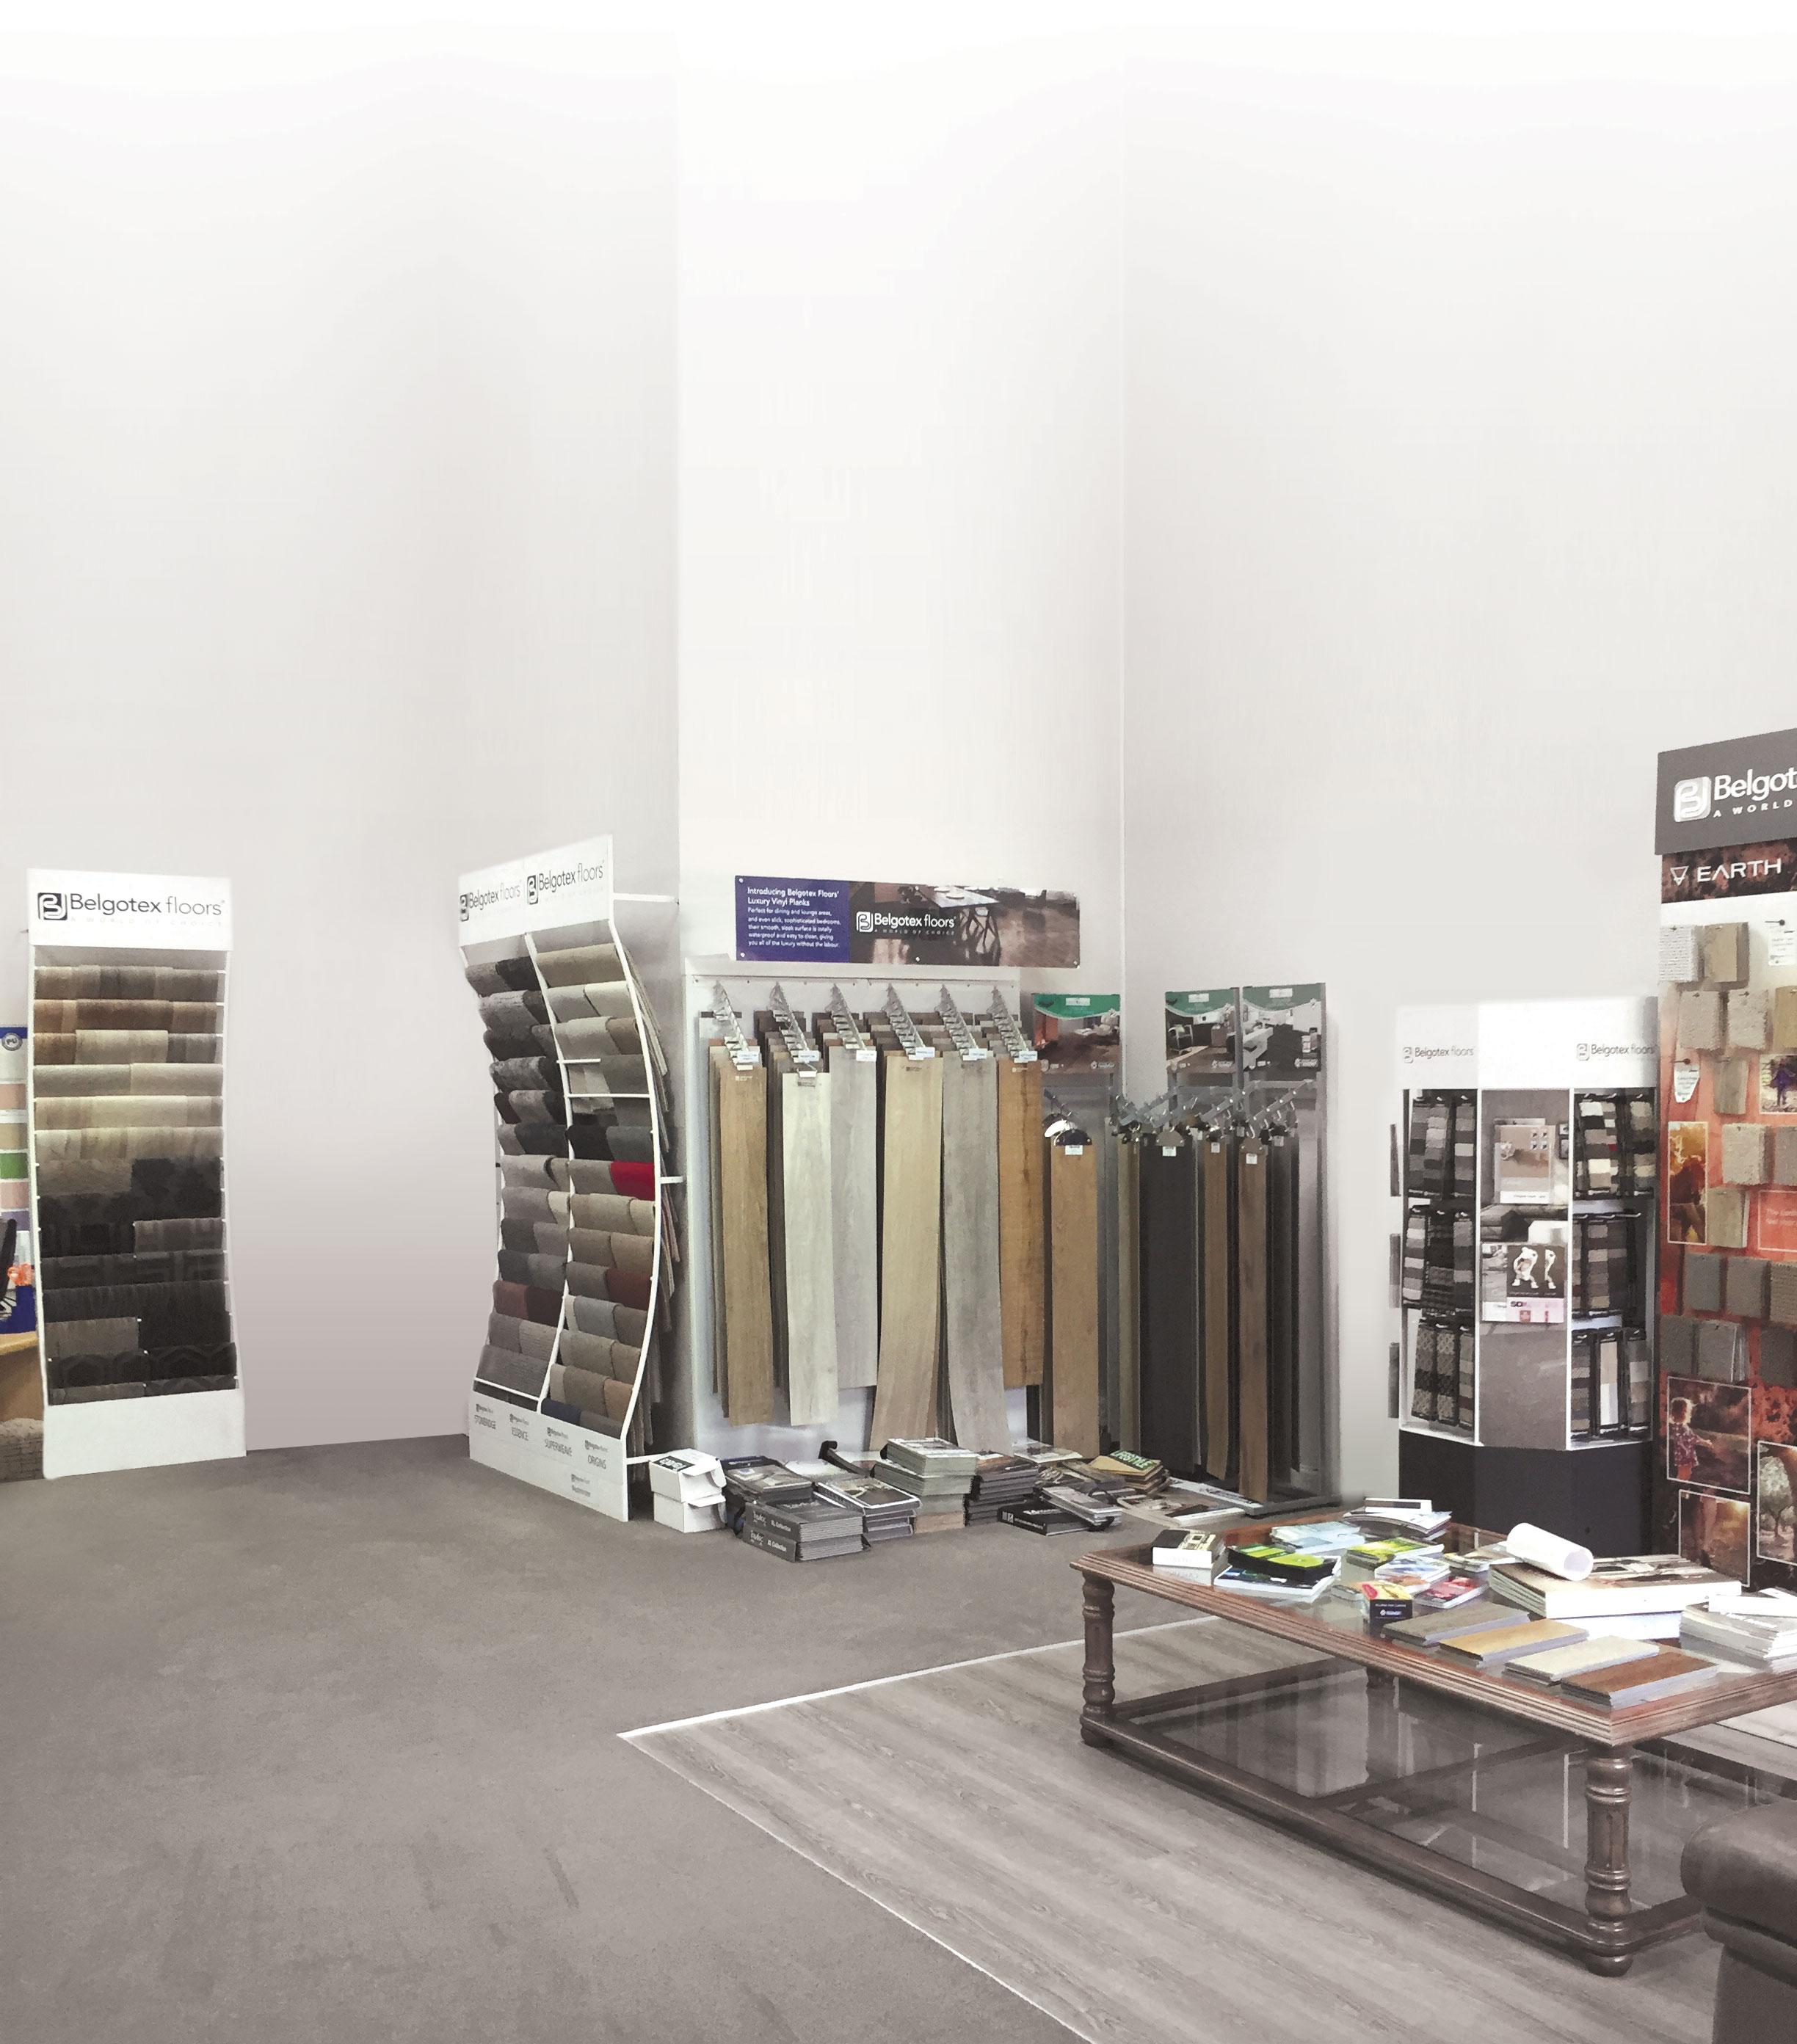 Image of Port Elizabeth Flooring Showroom